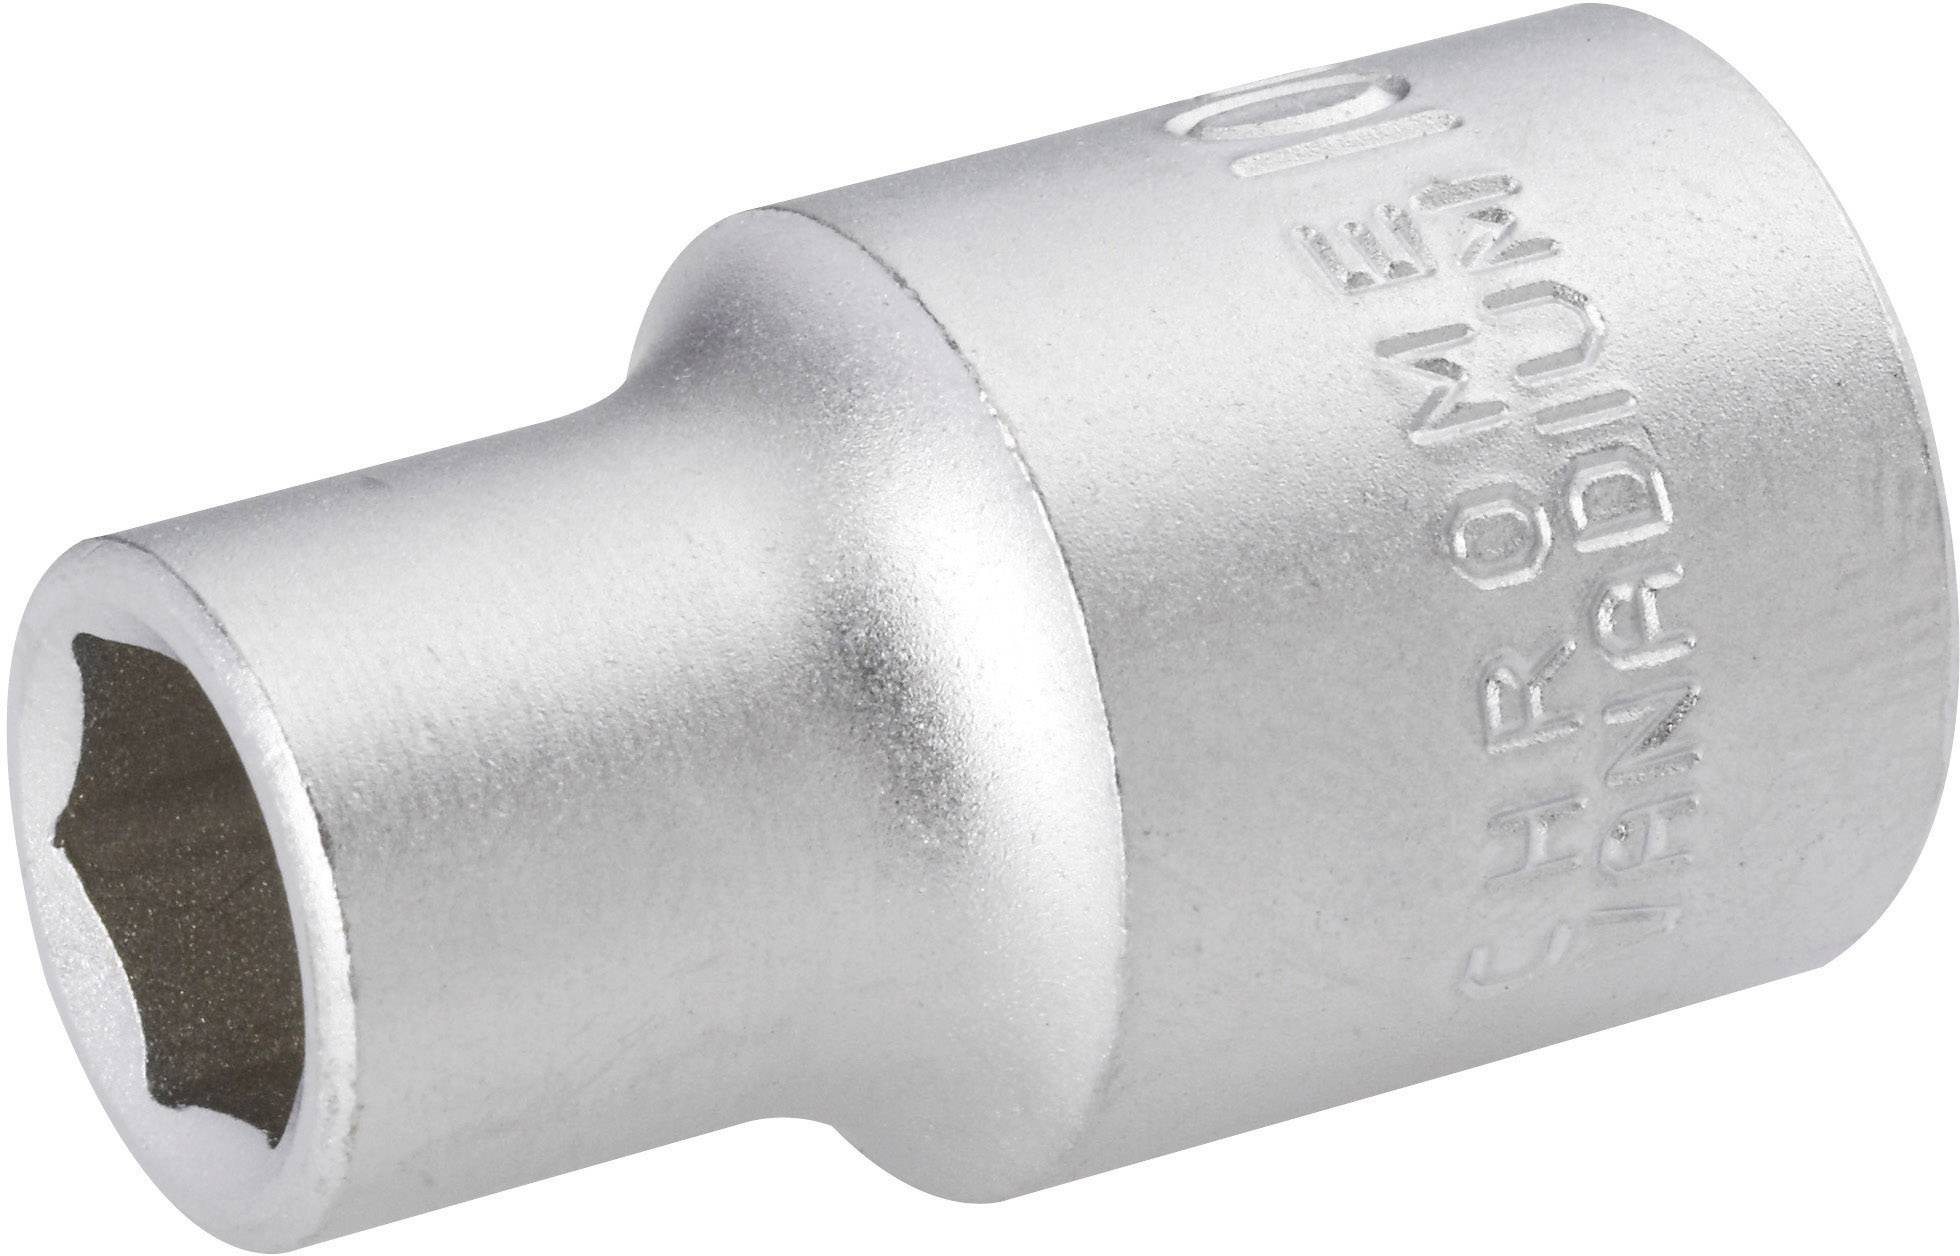 "Nadstavec na račňu TOOLCRAFT 820777, 1/2"" (12.5 mm), 22 mm"